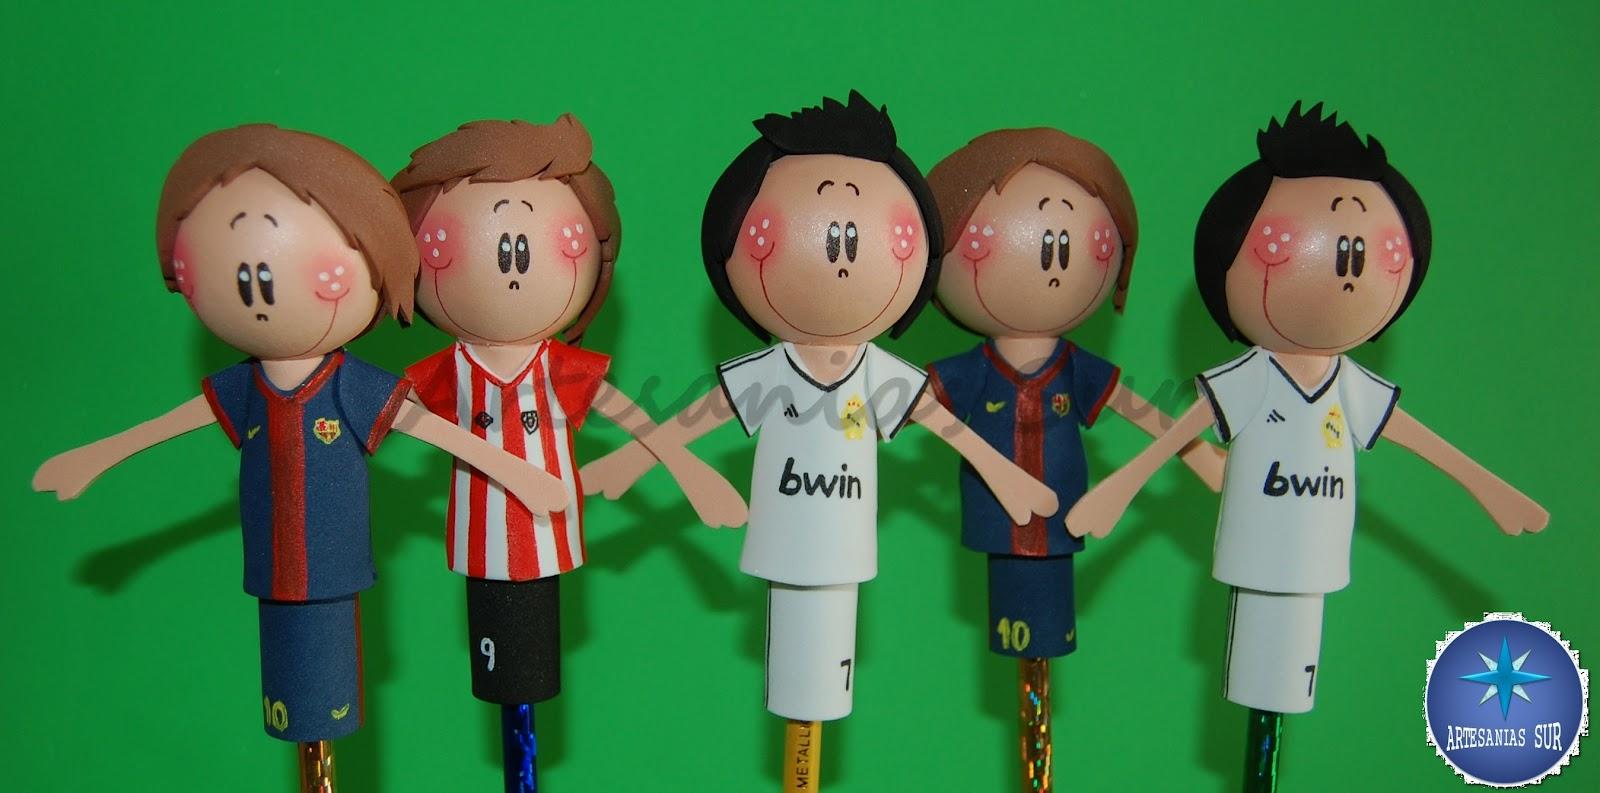 ARTESANIAS SUR: Fofulapices futbolistasCristiano,LLorente, Messi